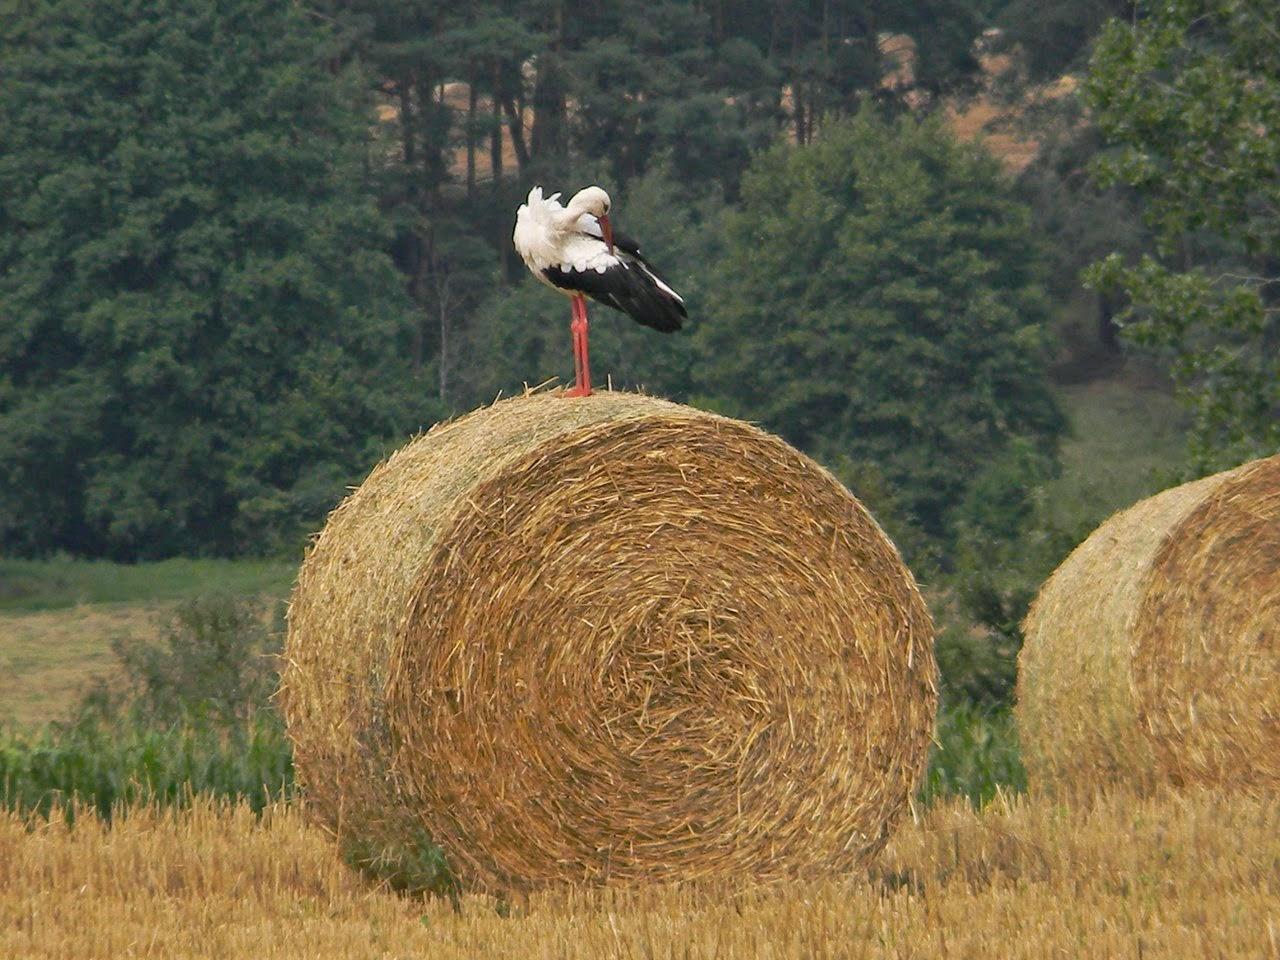 ptaki, bocian, przyroda lubuska